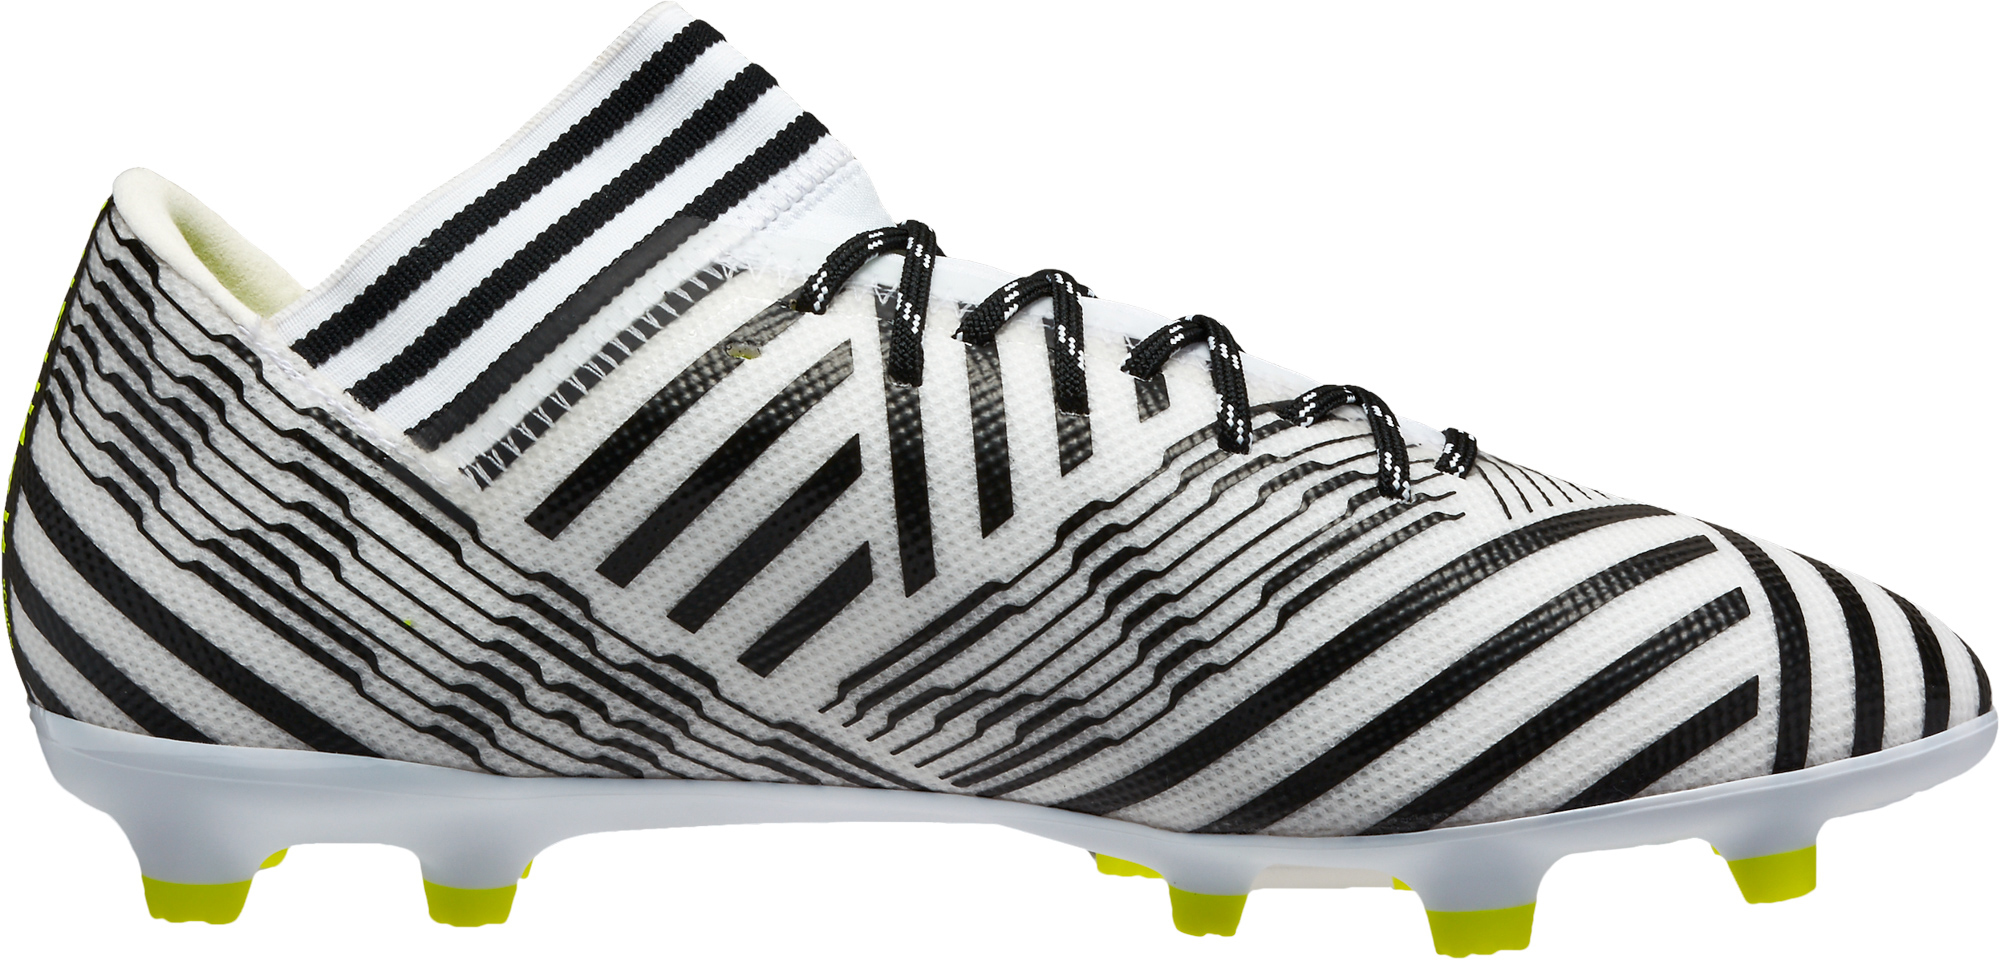 297dd9c04030 adidas nemeziz 173 fg white soccer cleats